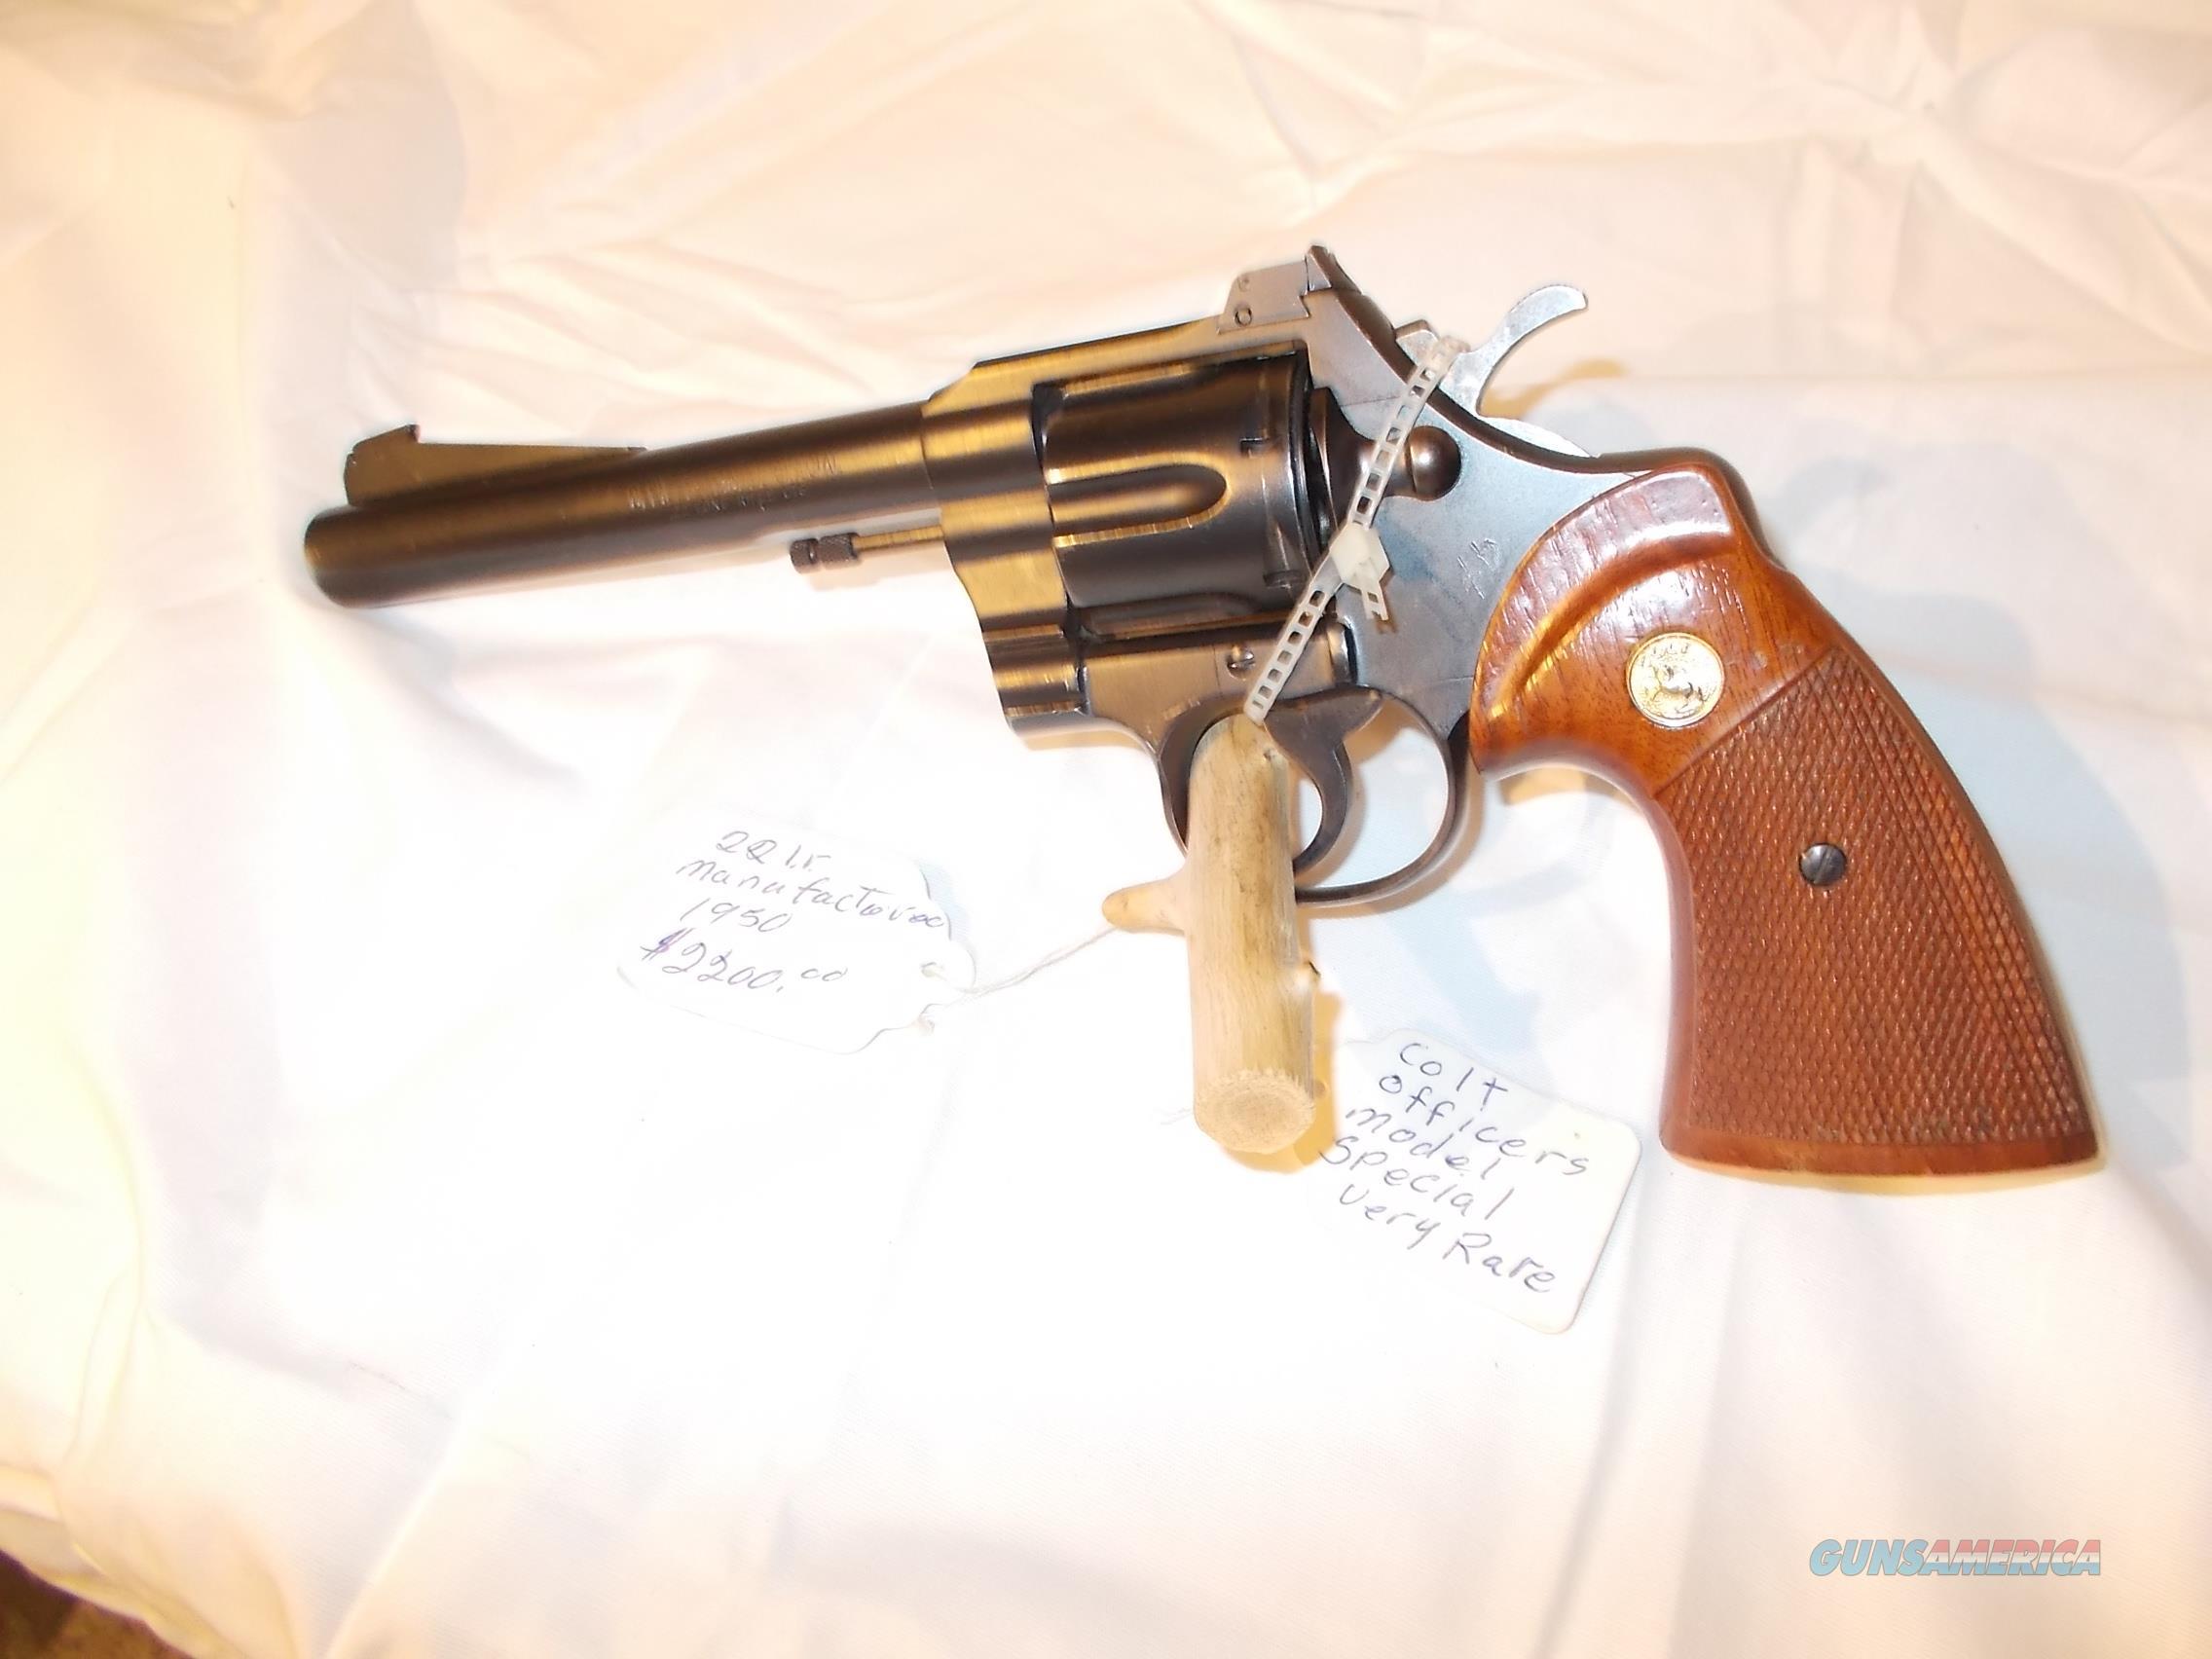 colt officers model special 22lr very rare  Guns > Pistols > Colt Single Action Revolvers - Modern (22 Cal.)